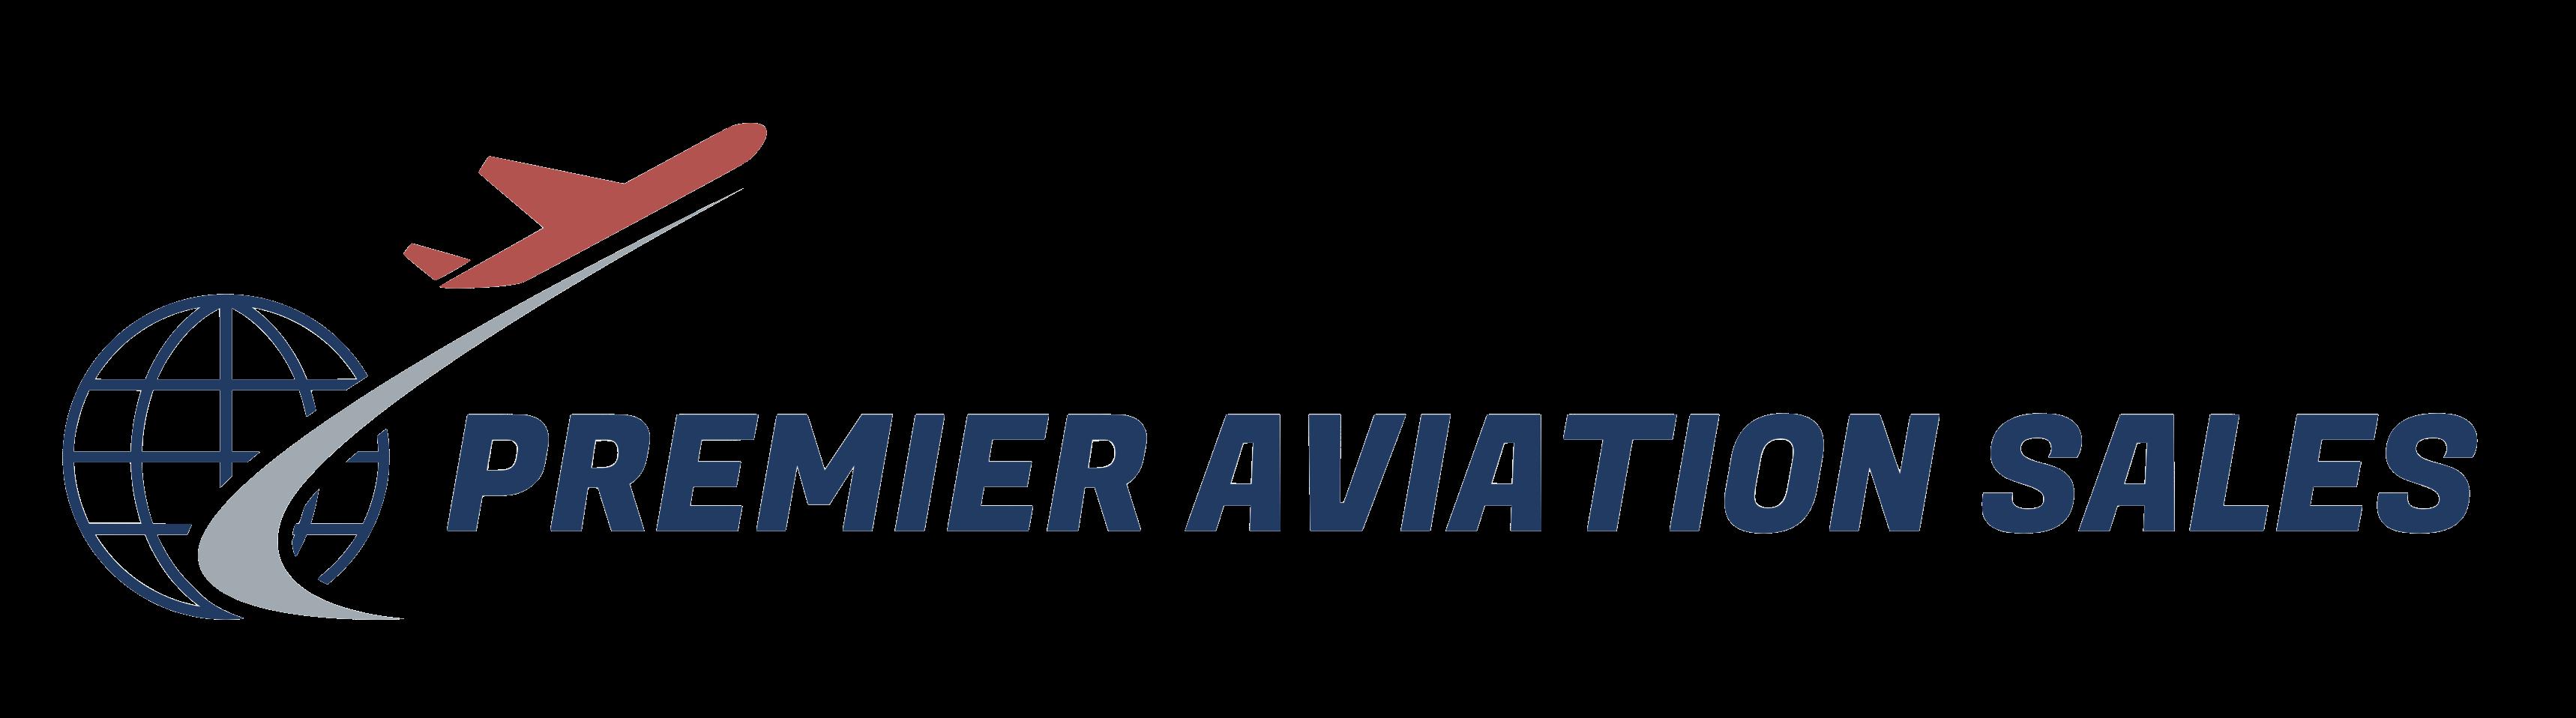 Premier Aviation Sales